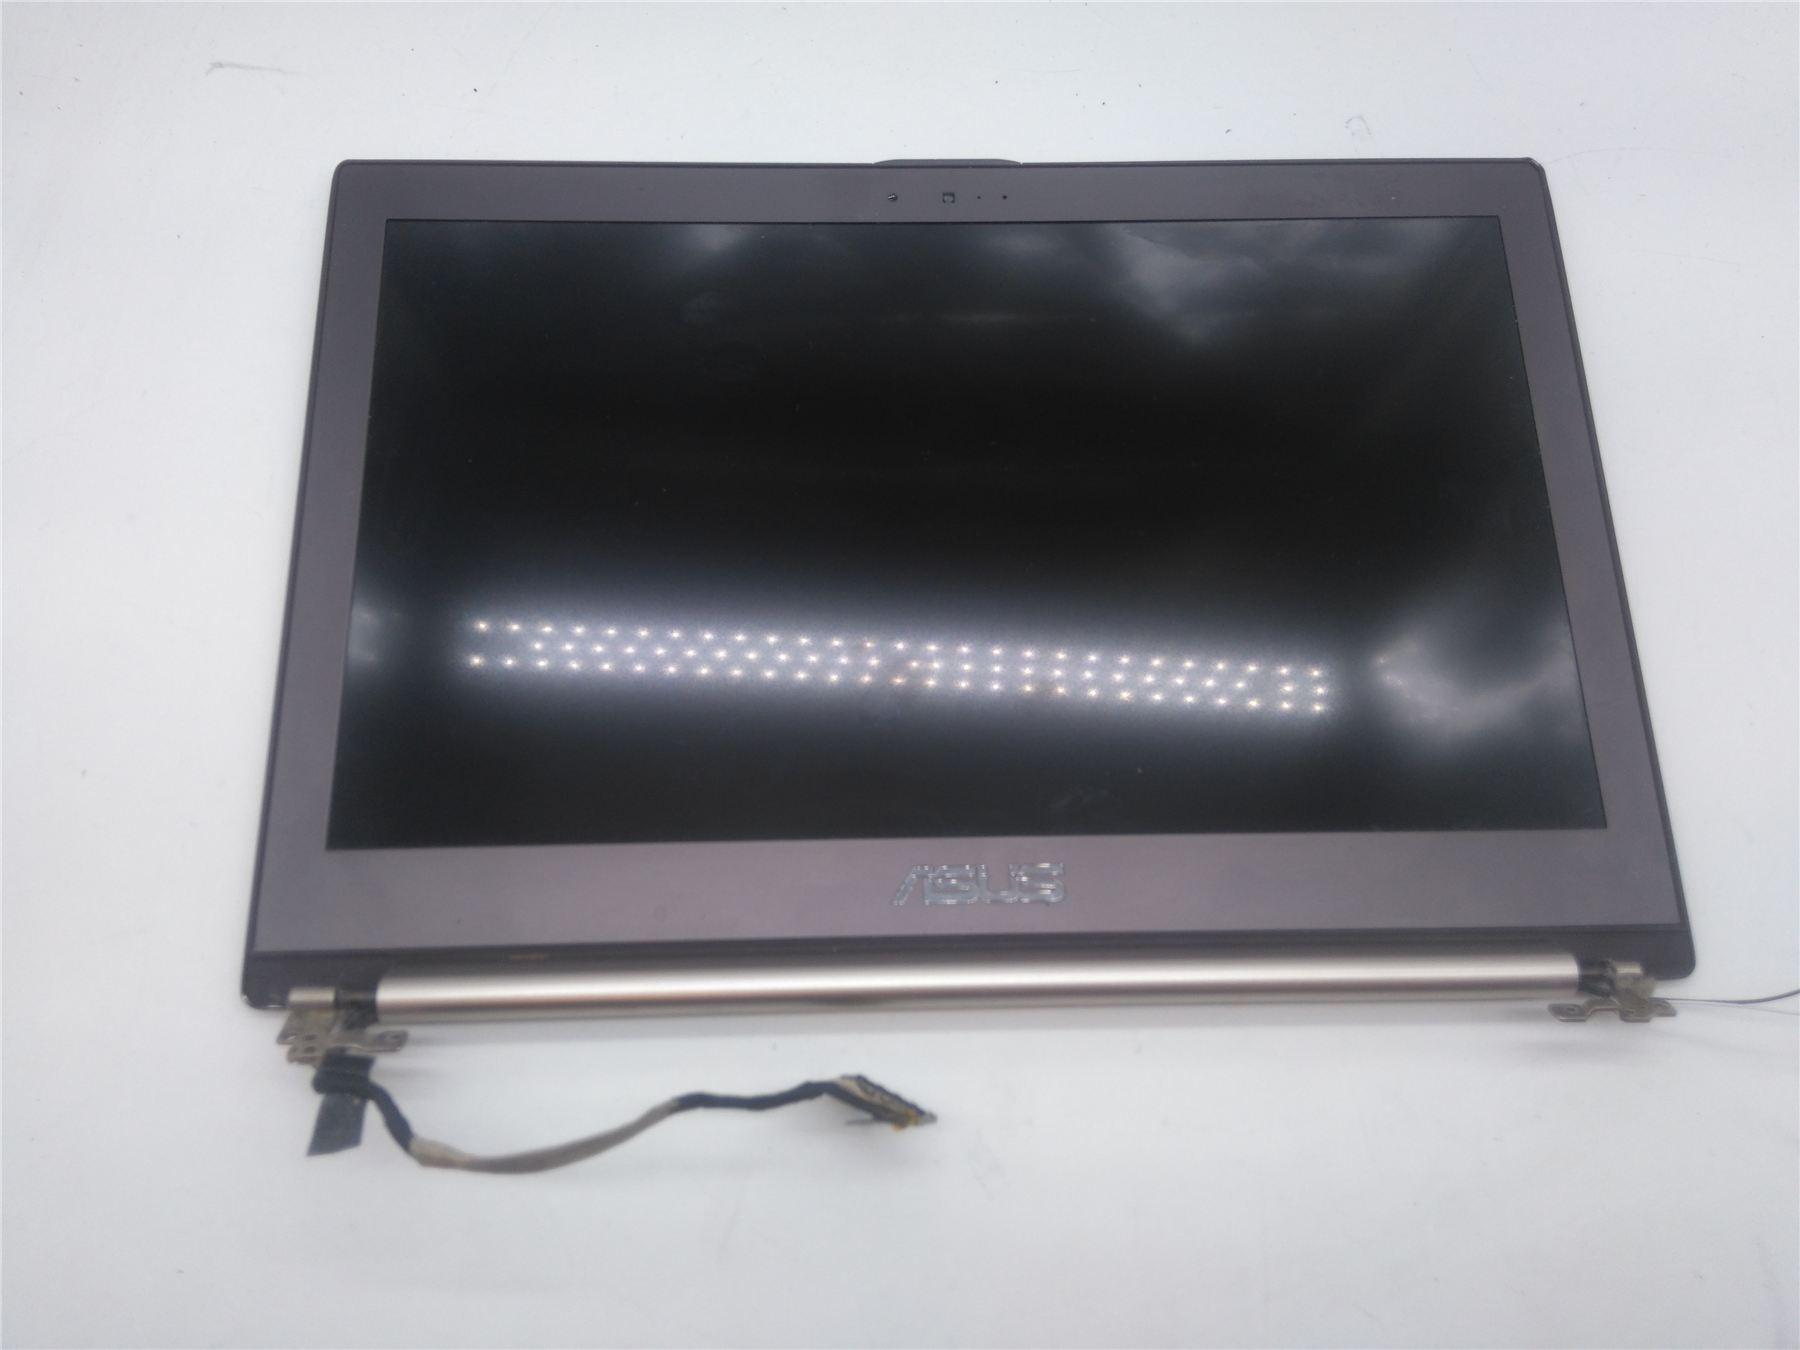 Asus UX32VD LCD Screen Display Bezel Cover